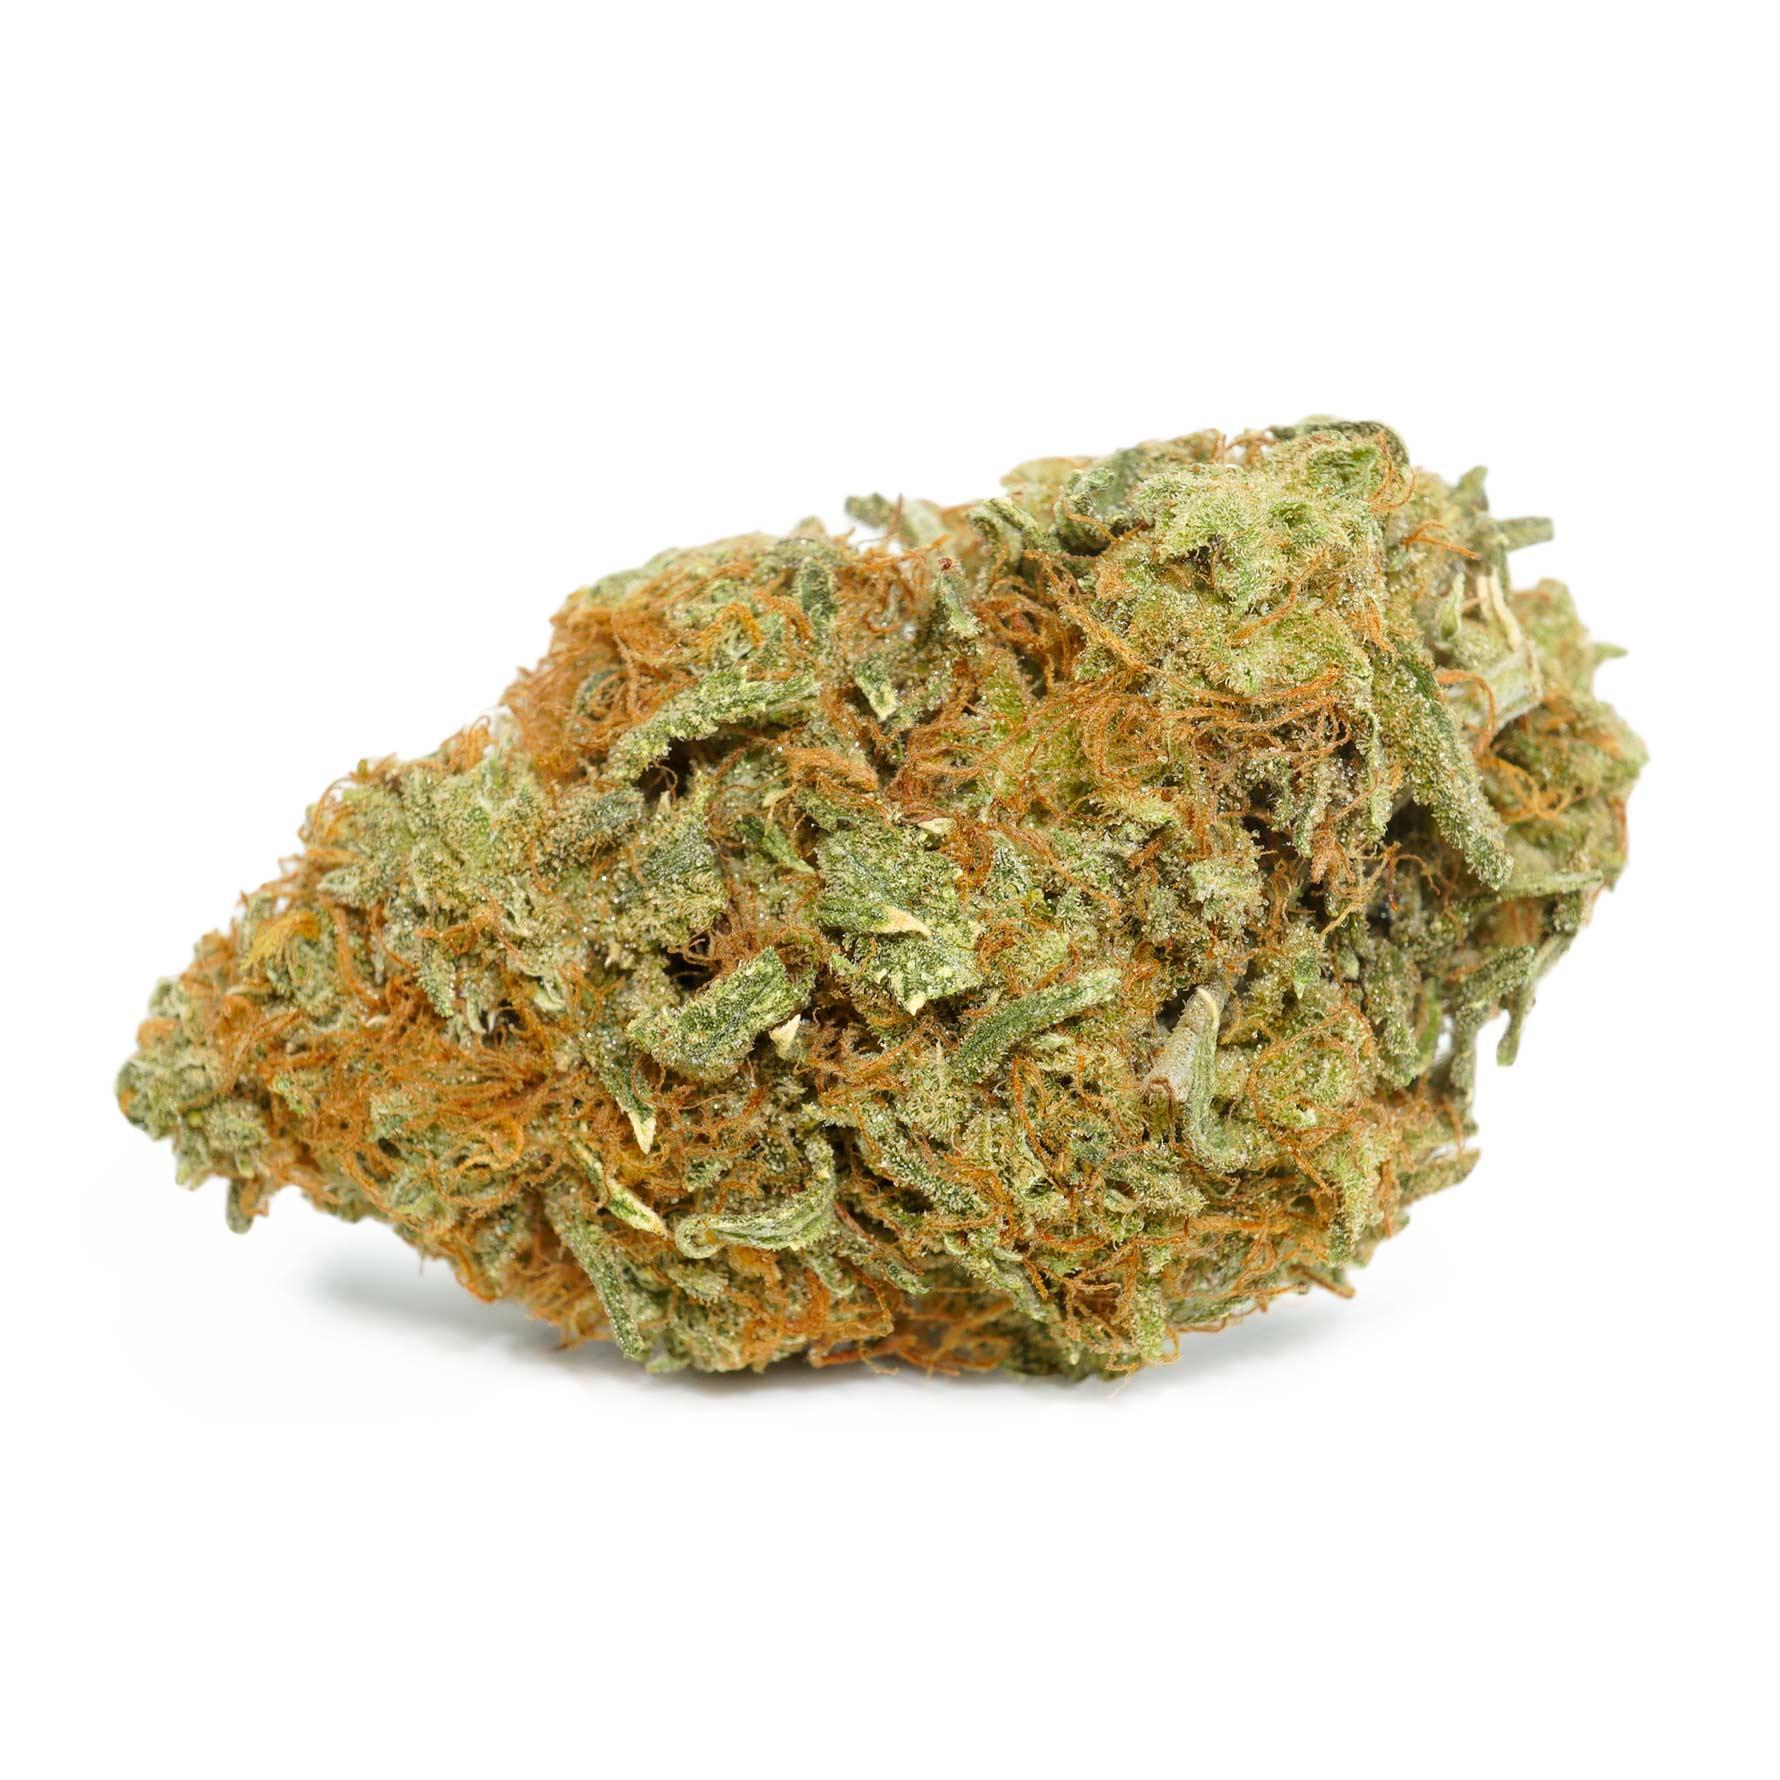 Ice-Wreck strain | Cannabis Deals